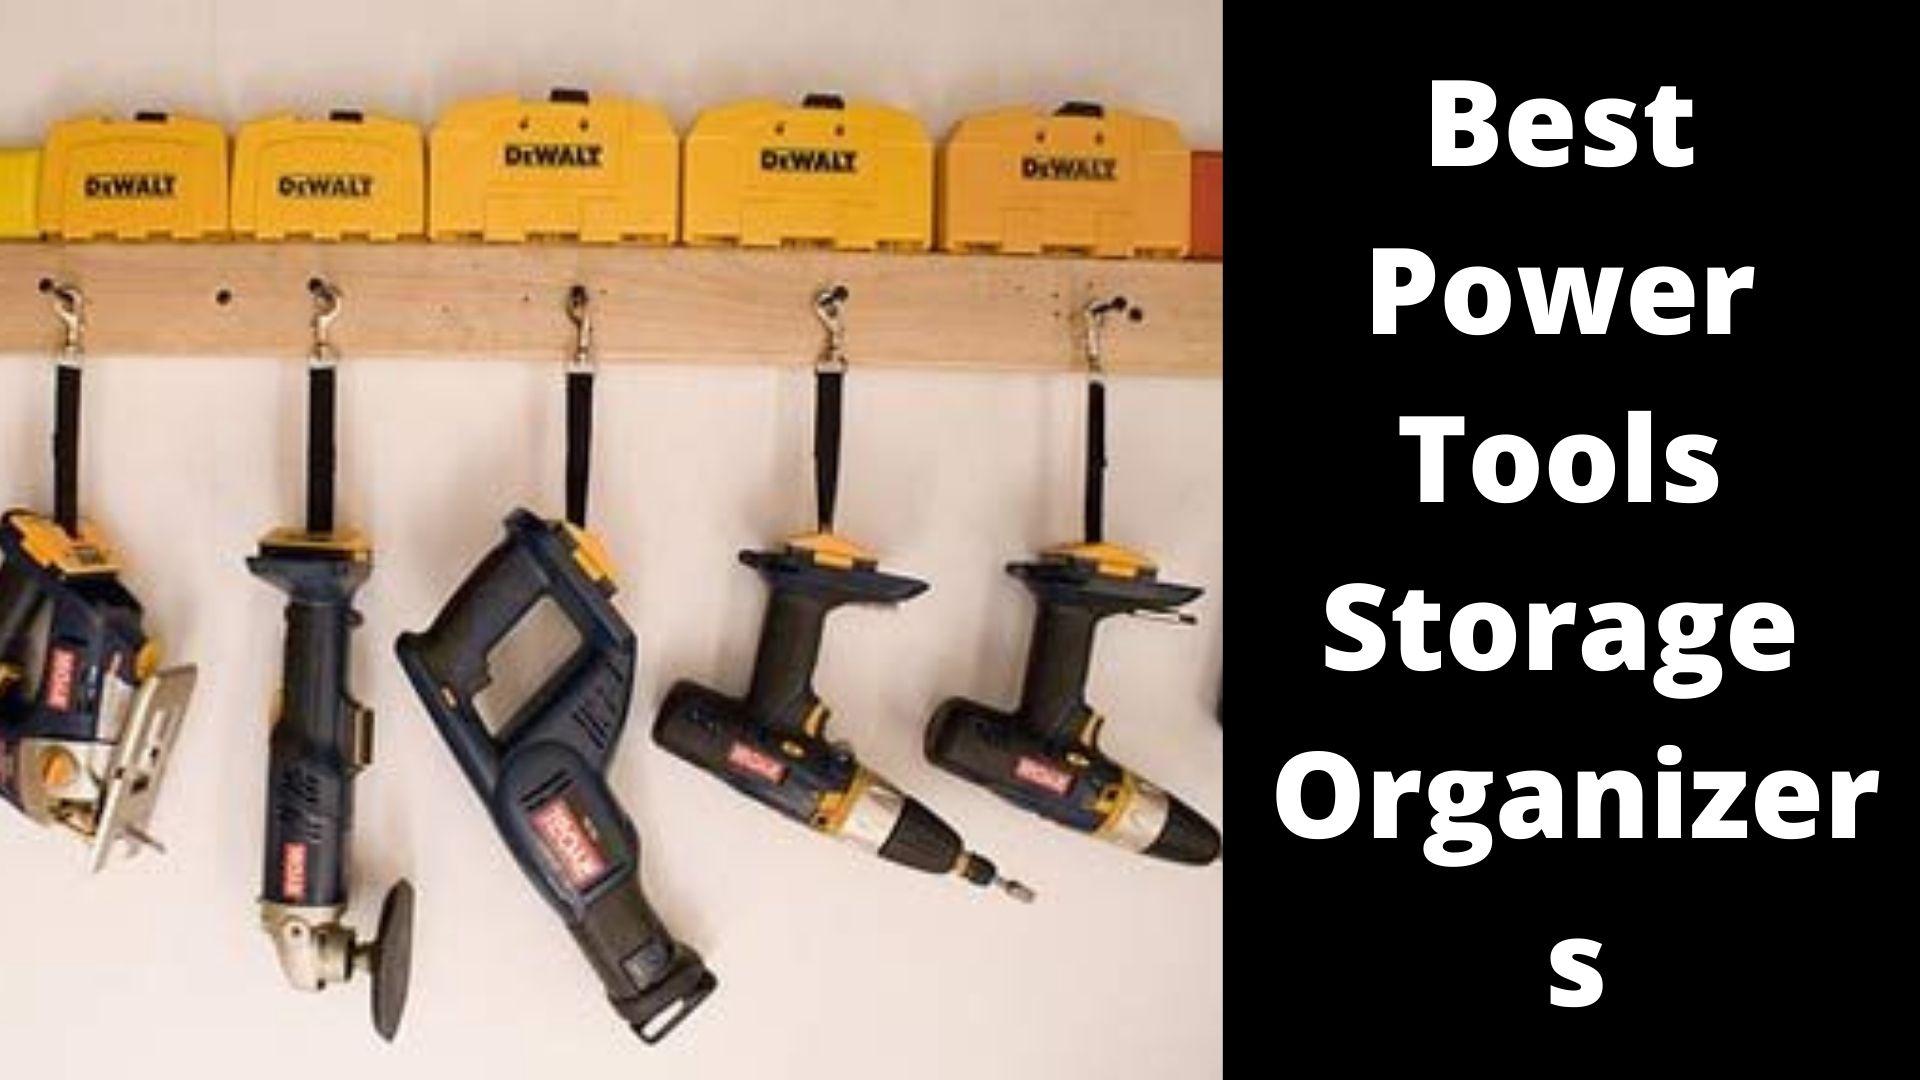 Best Power Tools Storage Organizers